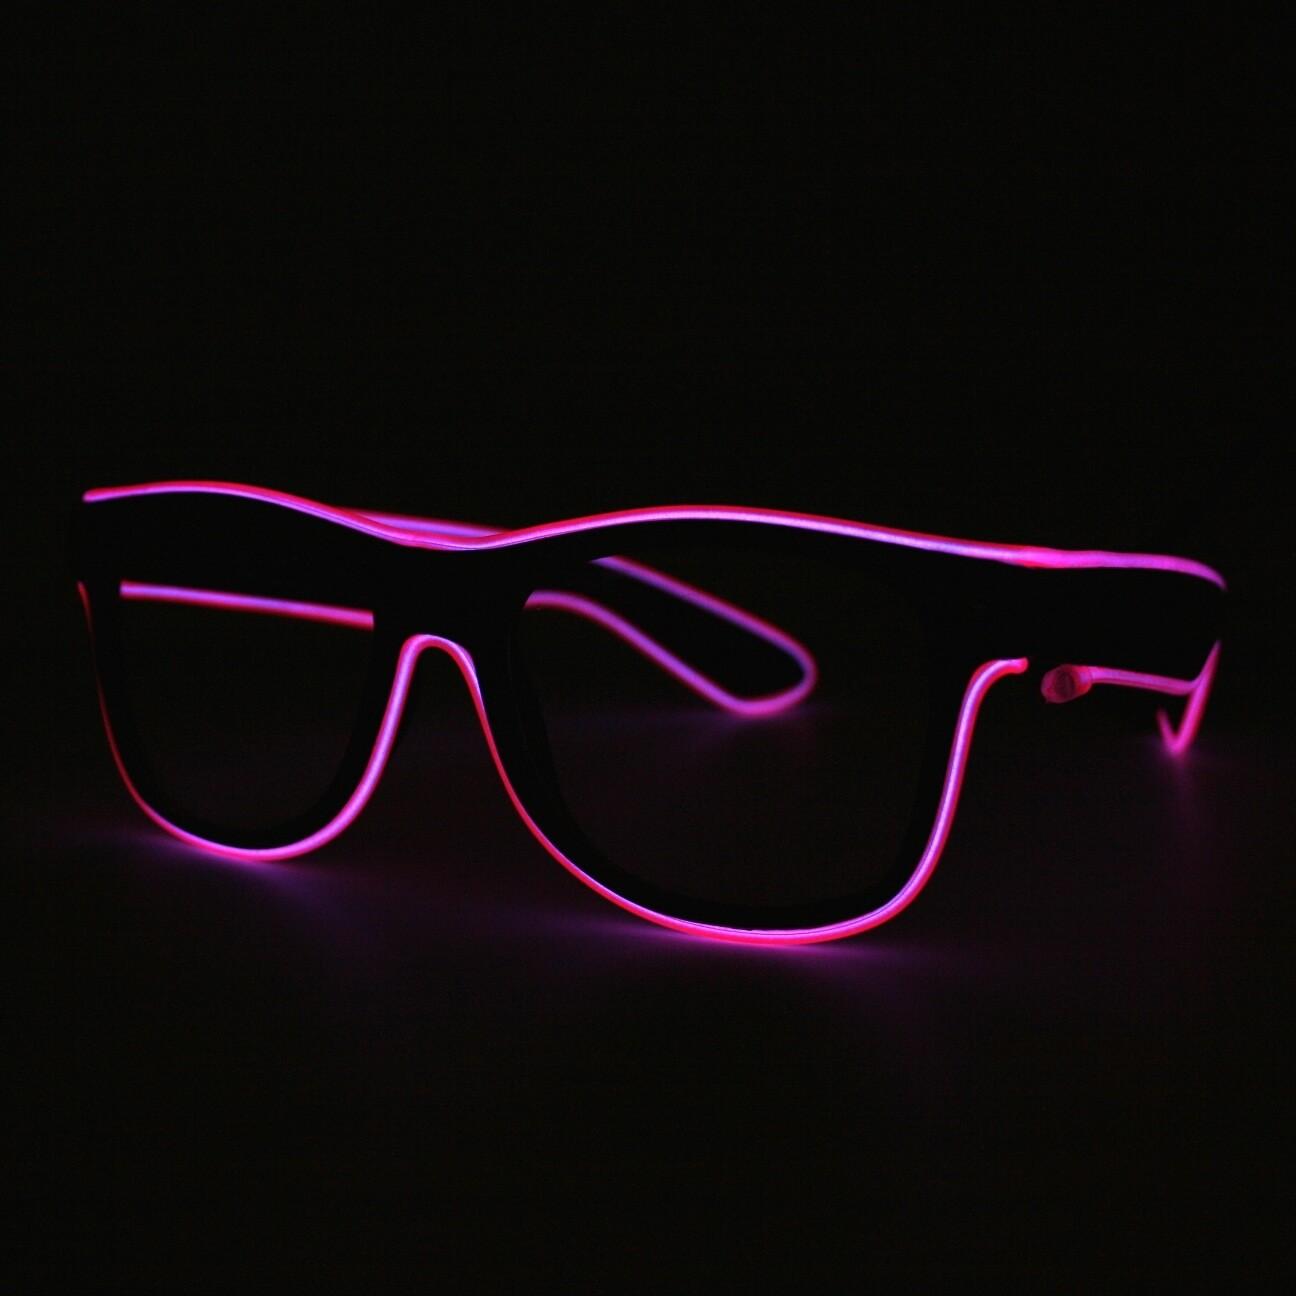 LED Neon Glasses Pink Transparent Glasses